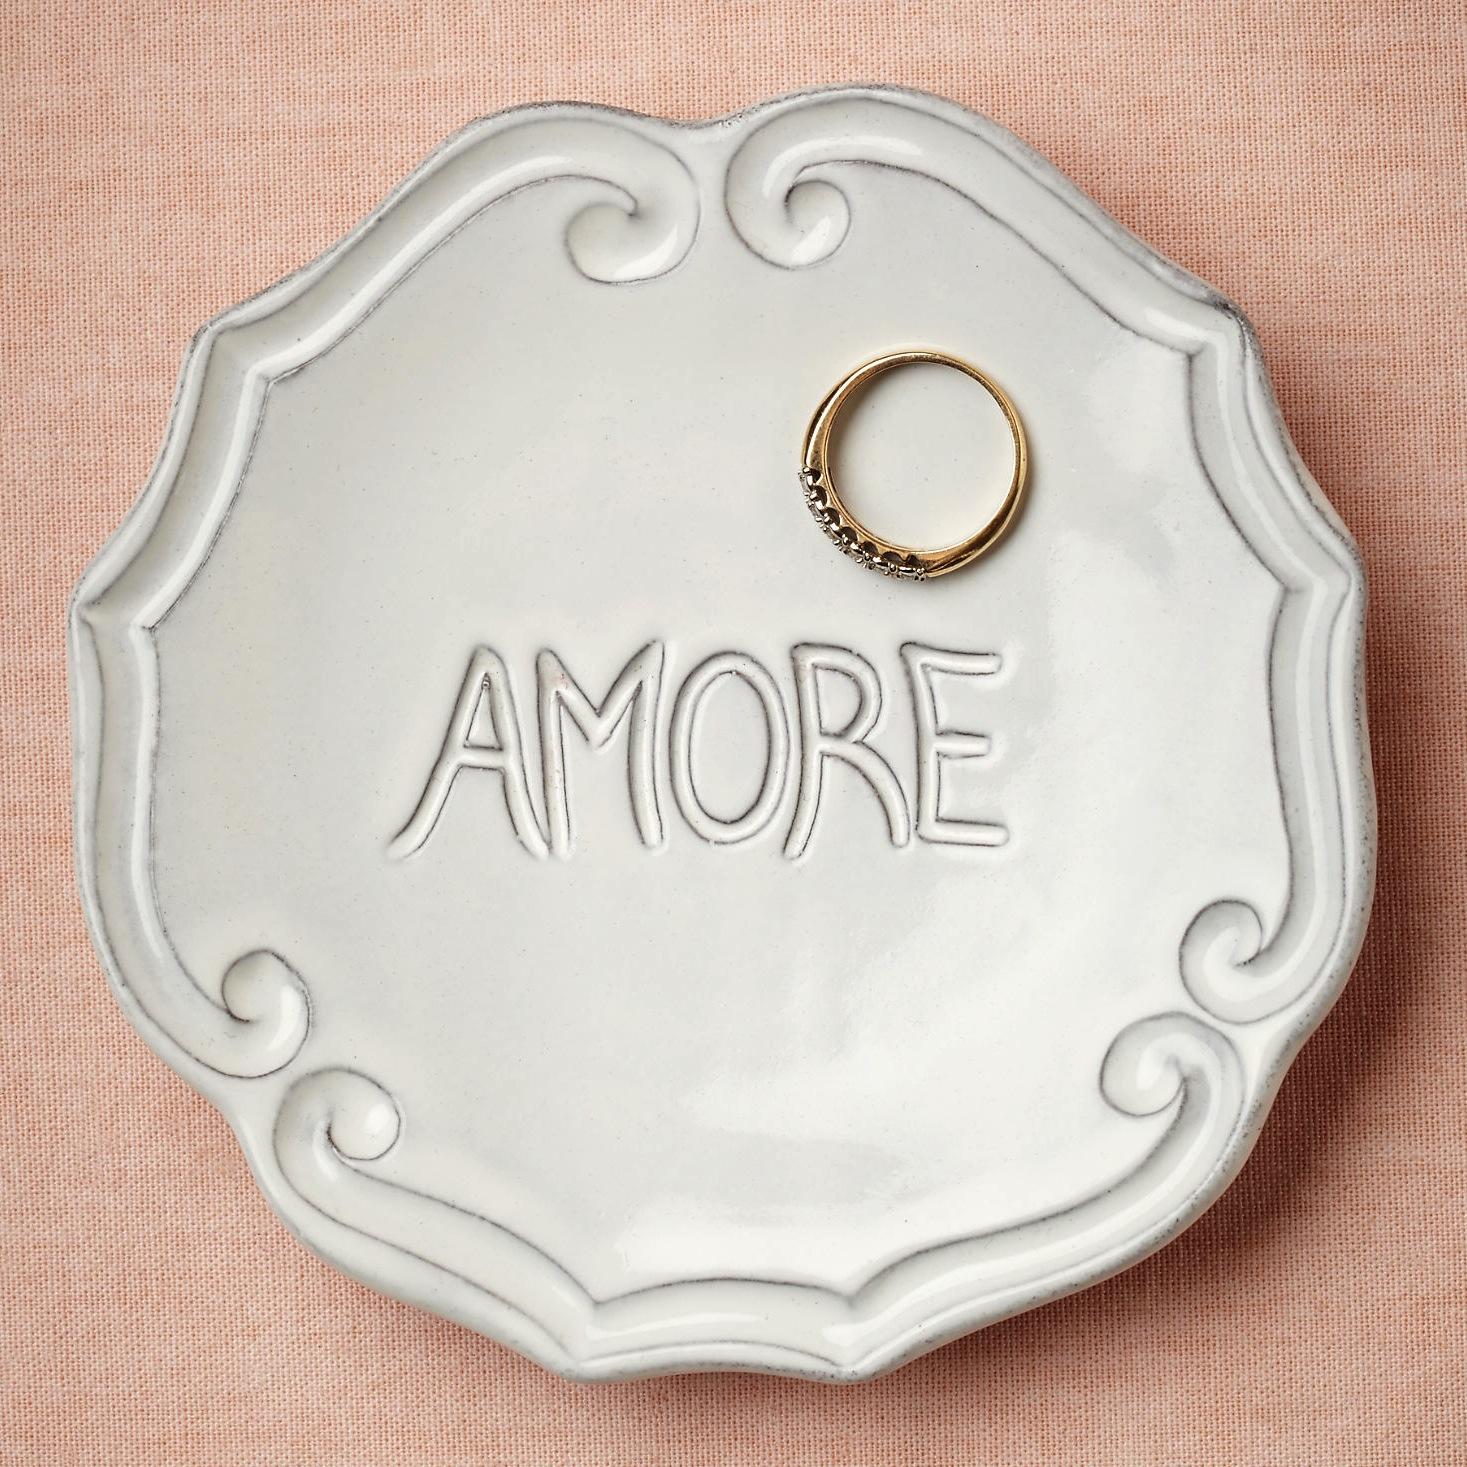 Amore Ring Dish